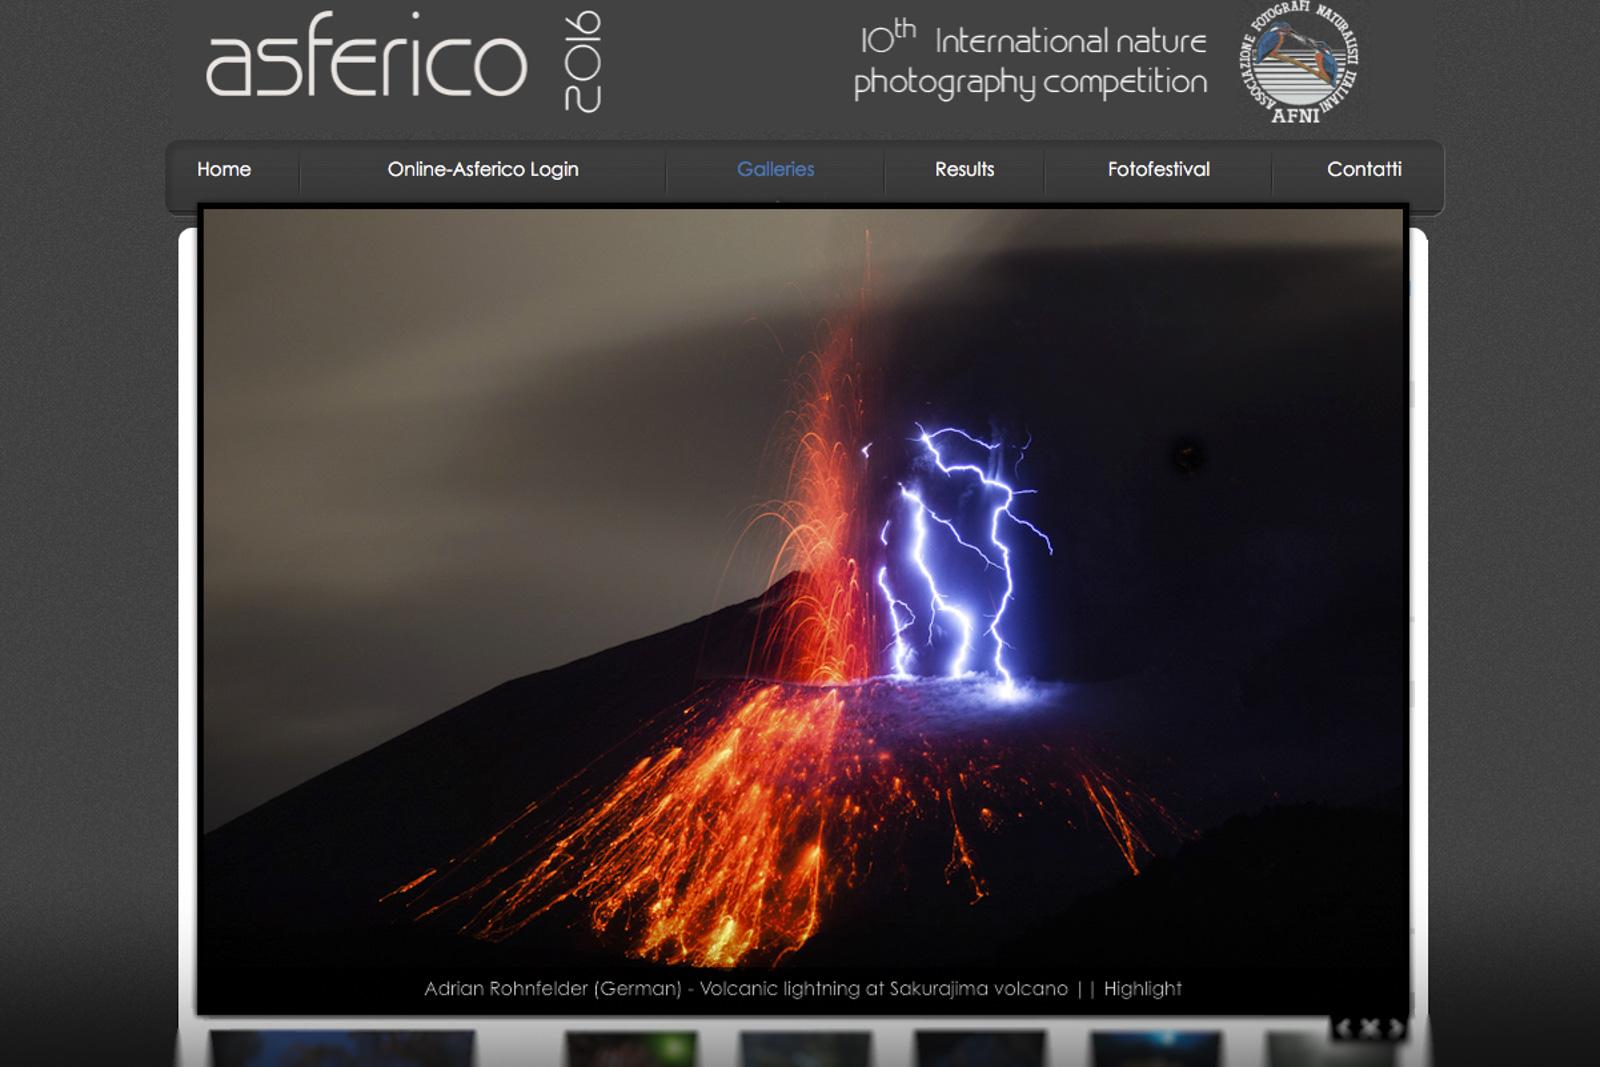 Asferico Fotowettbewerb